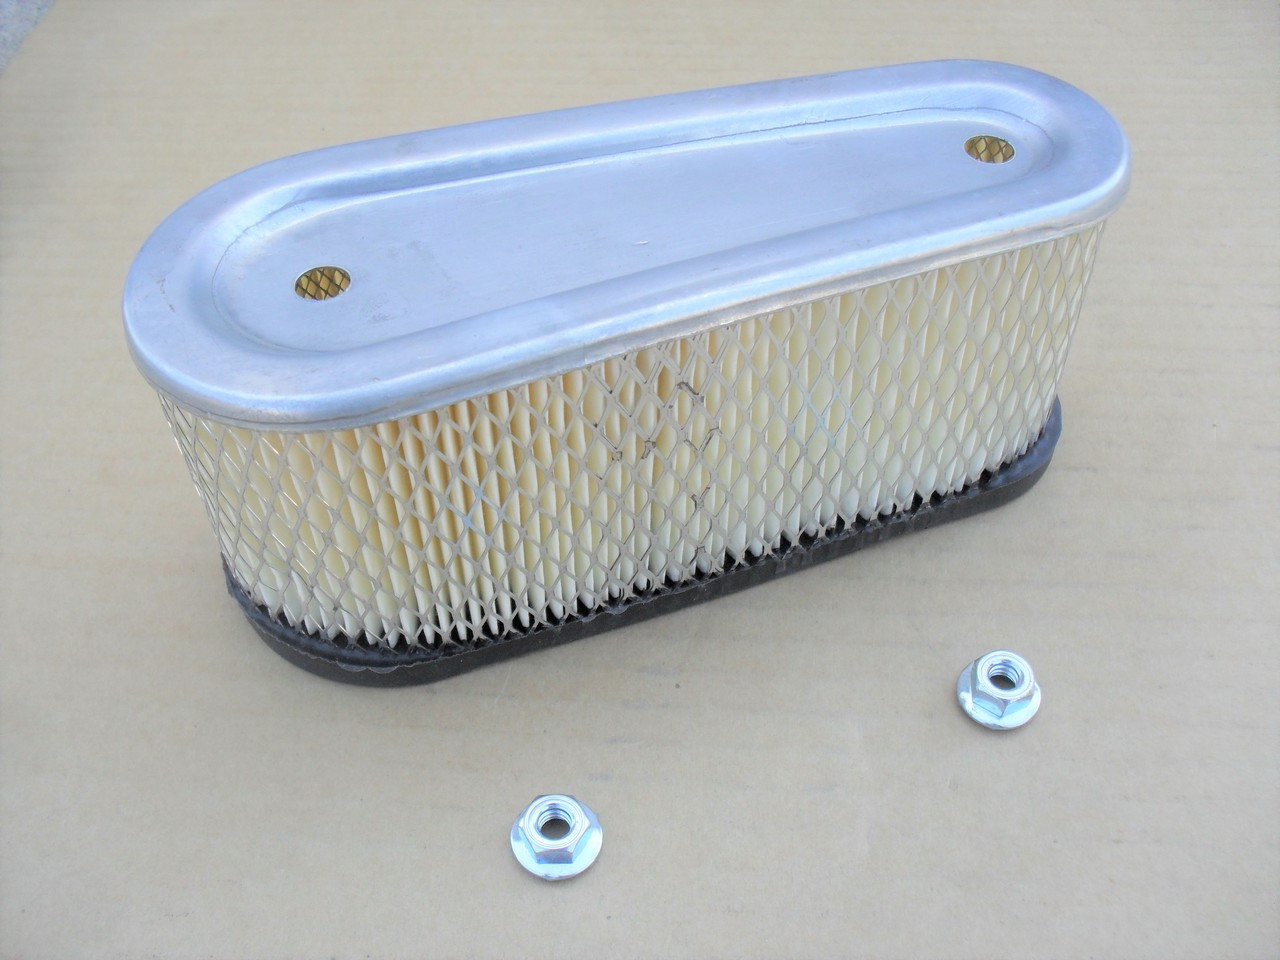 Air Filter for Tecumseh OHV110, OHV115, OHV125, OHV130, OHV150, OHV155,  OHV16, OHV165, OHV17 and OHV175, 36356